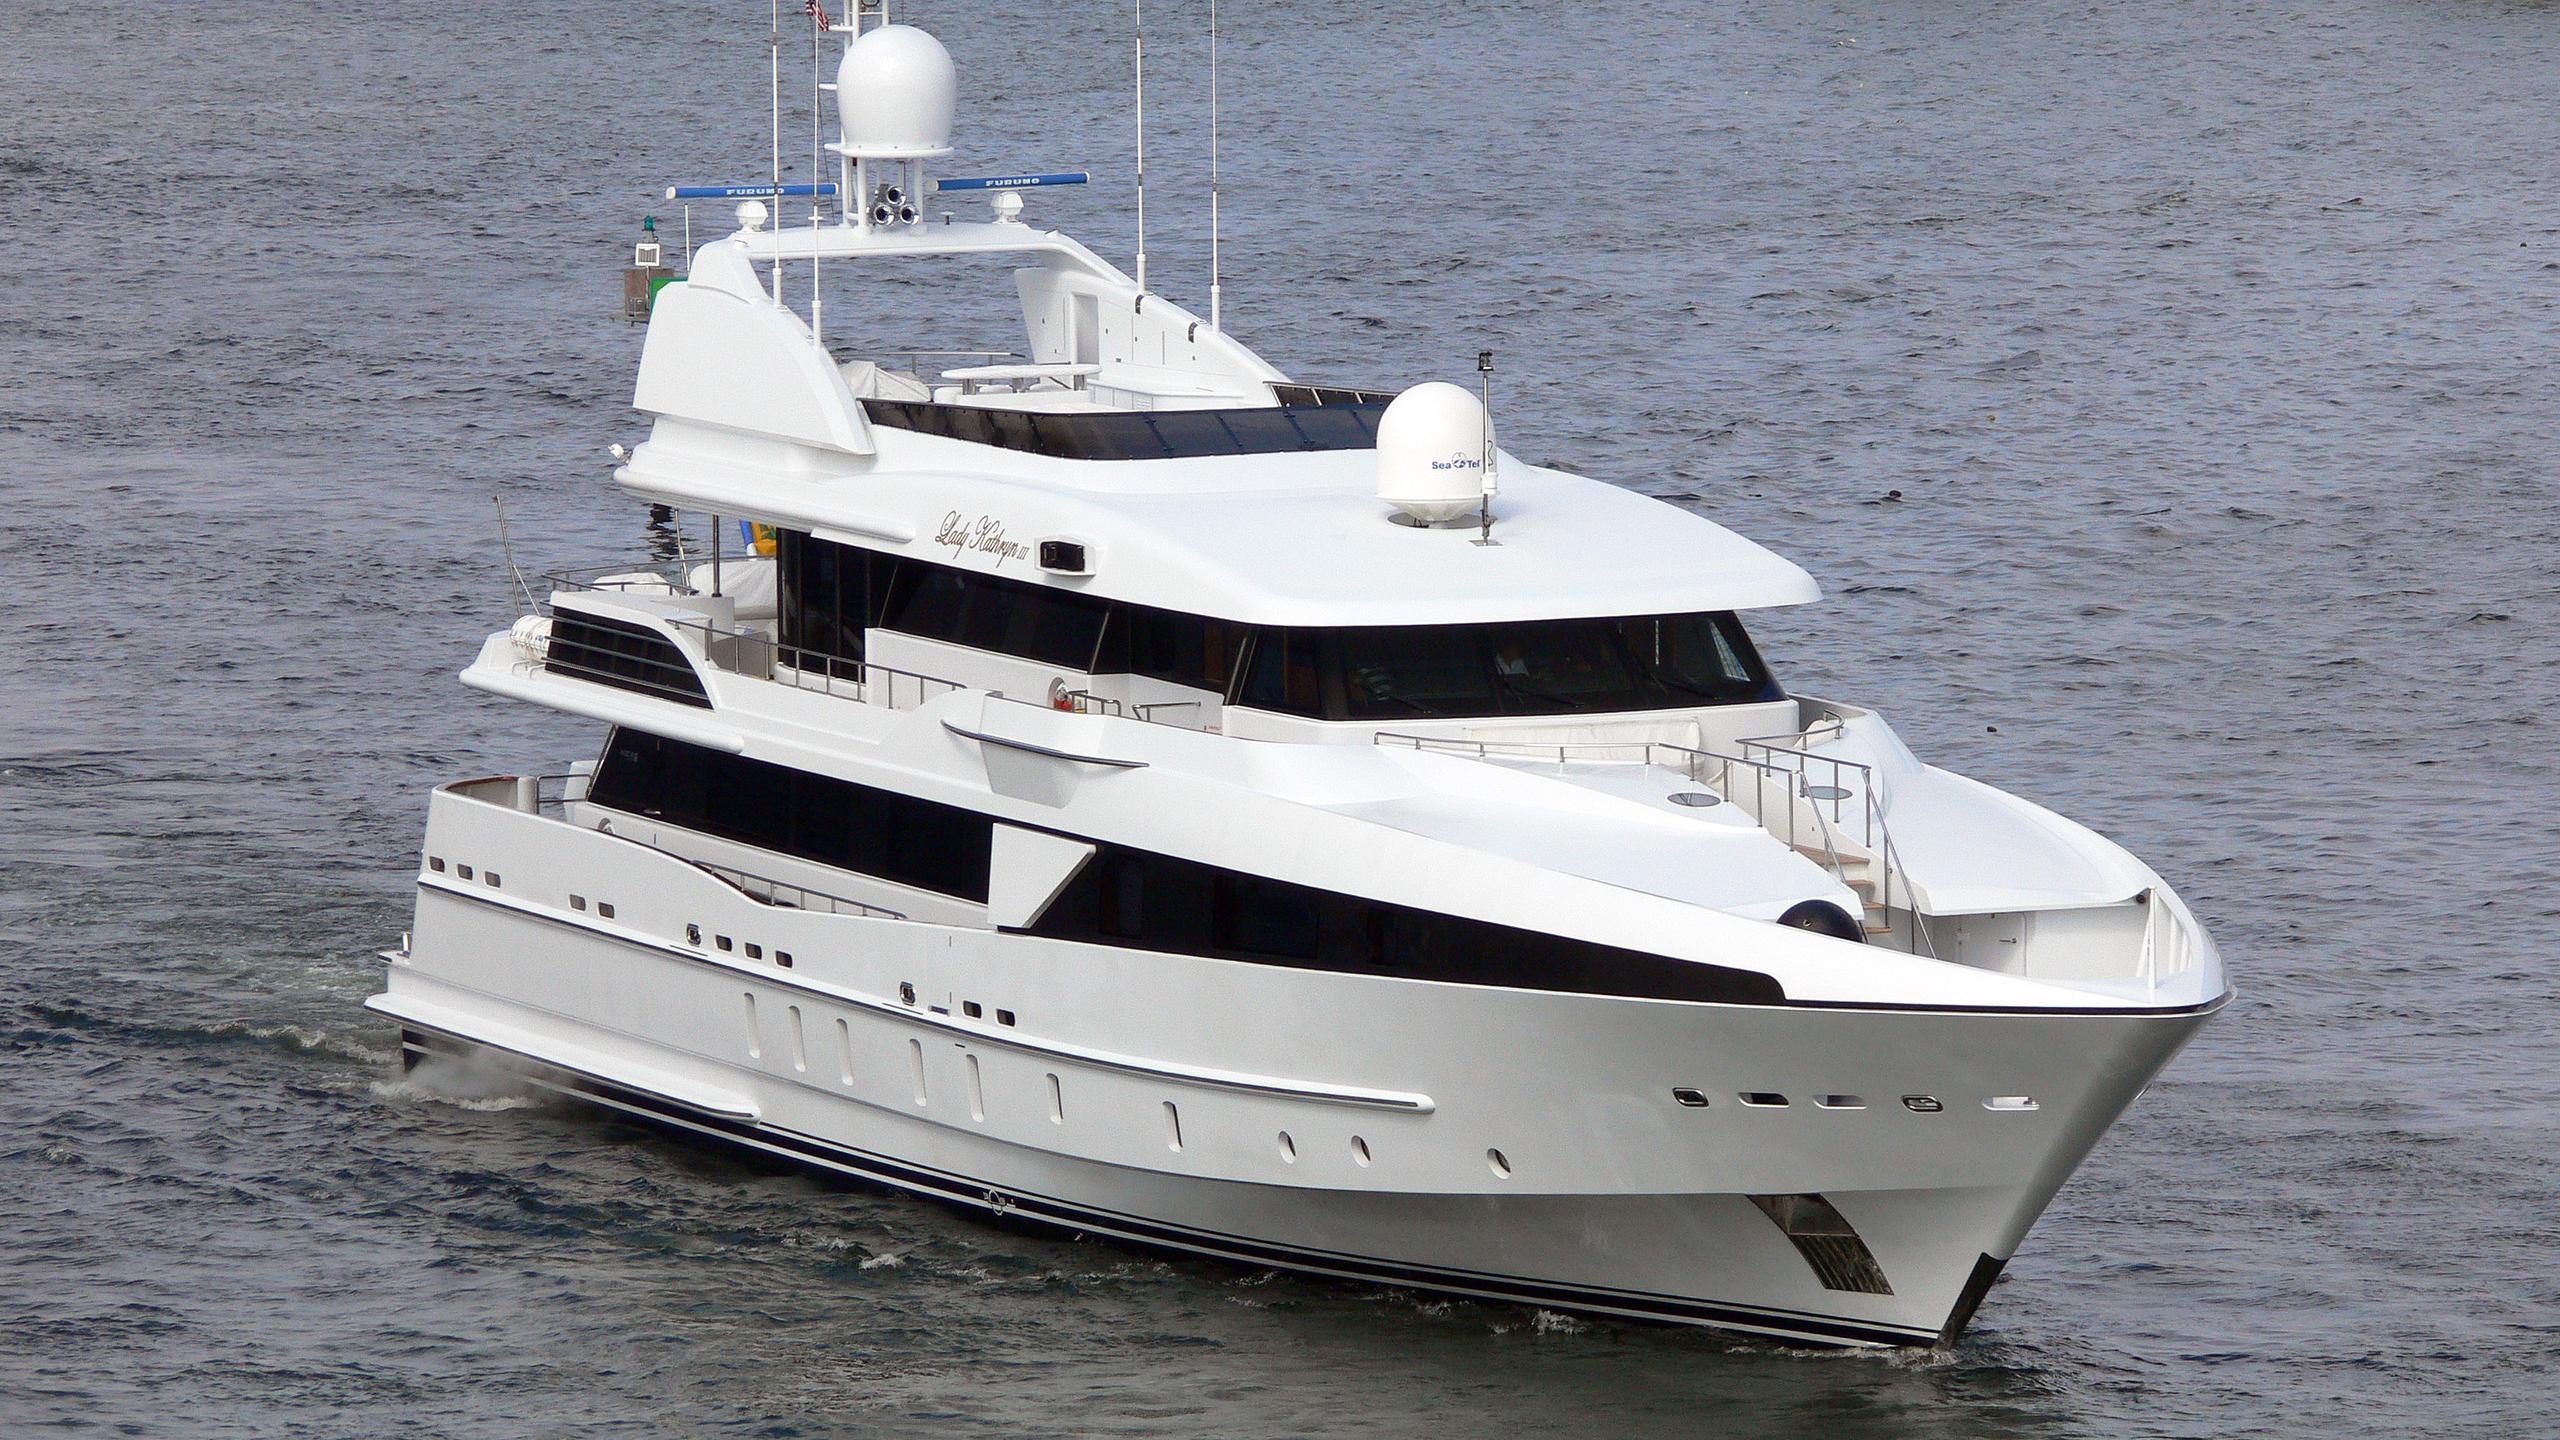 horizons-ii-motor-yacht-nqea-2004-44m-half-profile